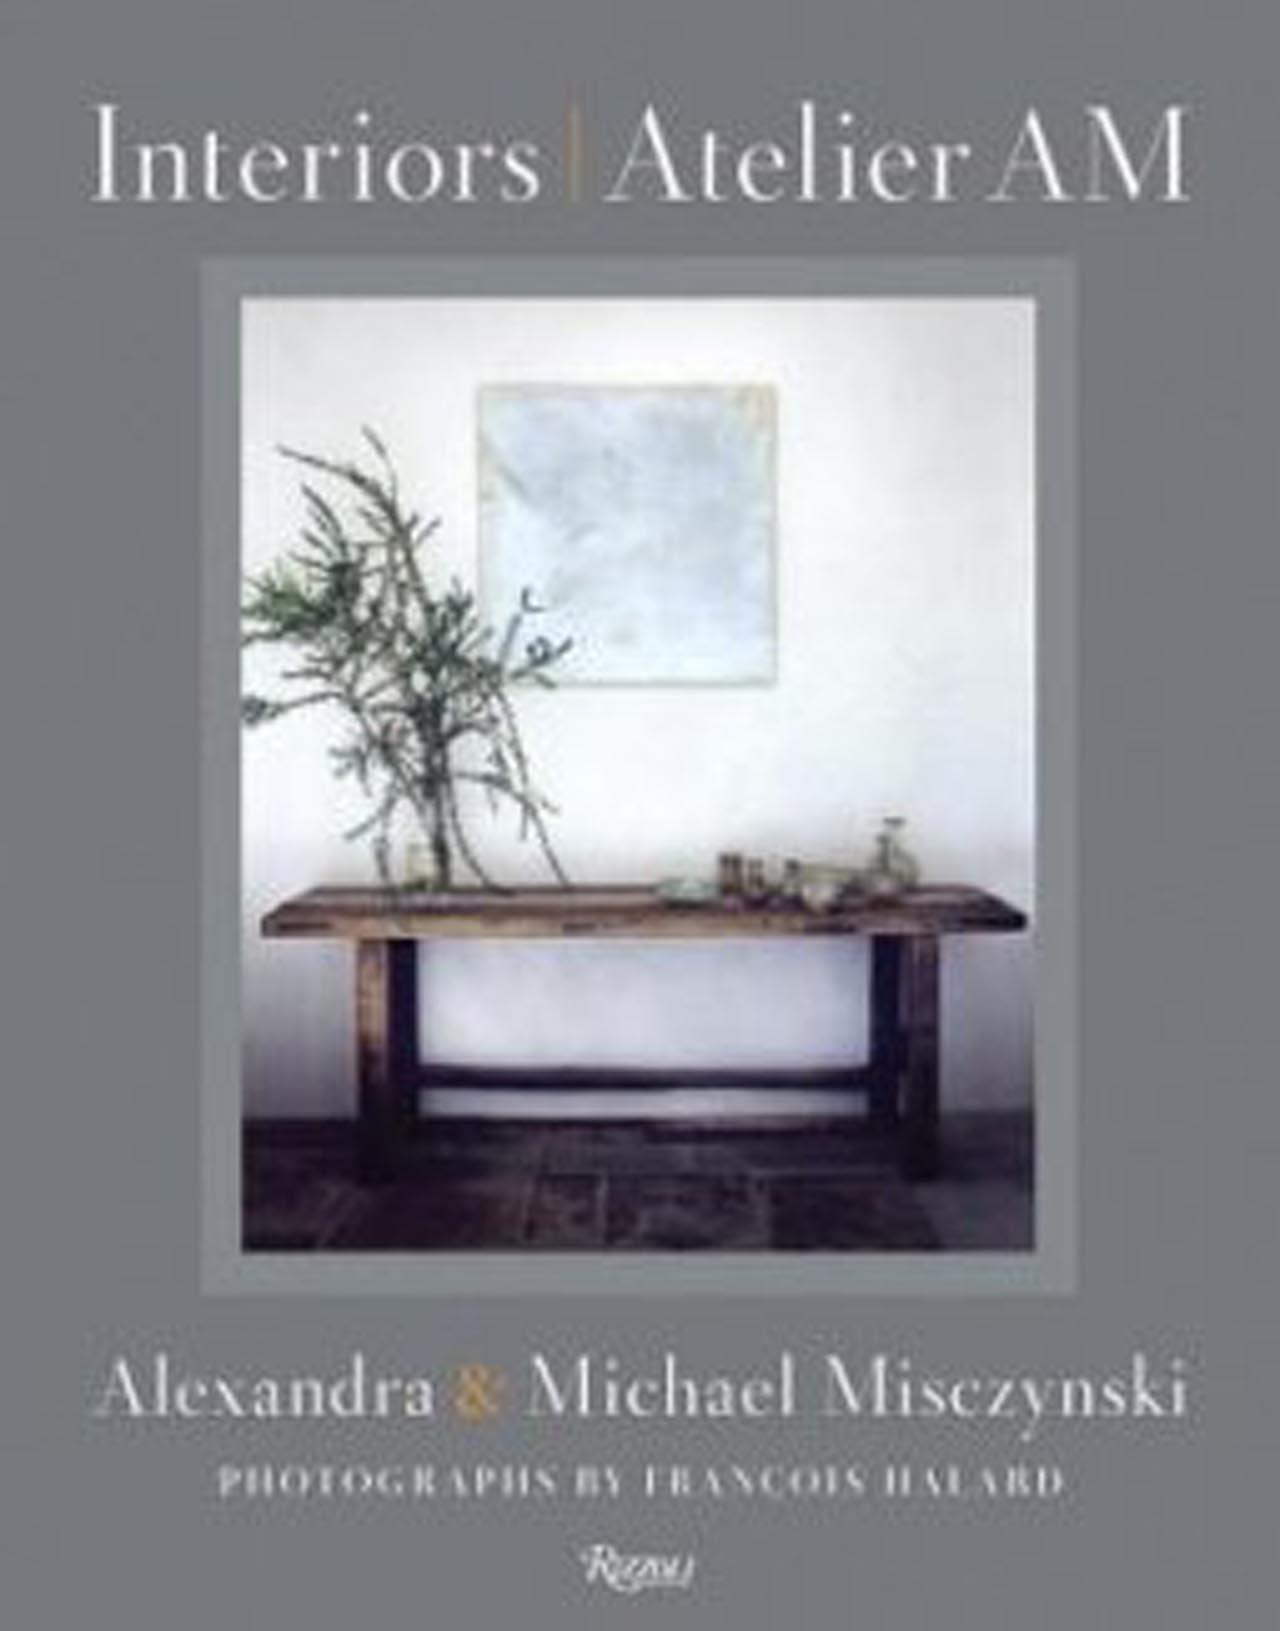 Interiors Atelier AM Alexandra Misczynski Michael Mayer Rus Franois Halard Axel Vervoordt 9780847838509 Amazon Books